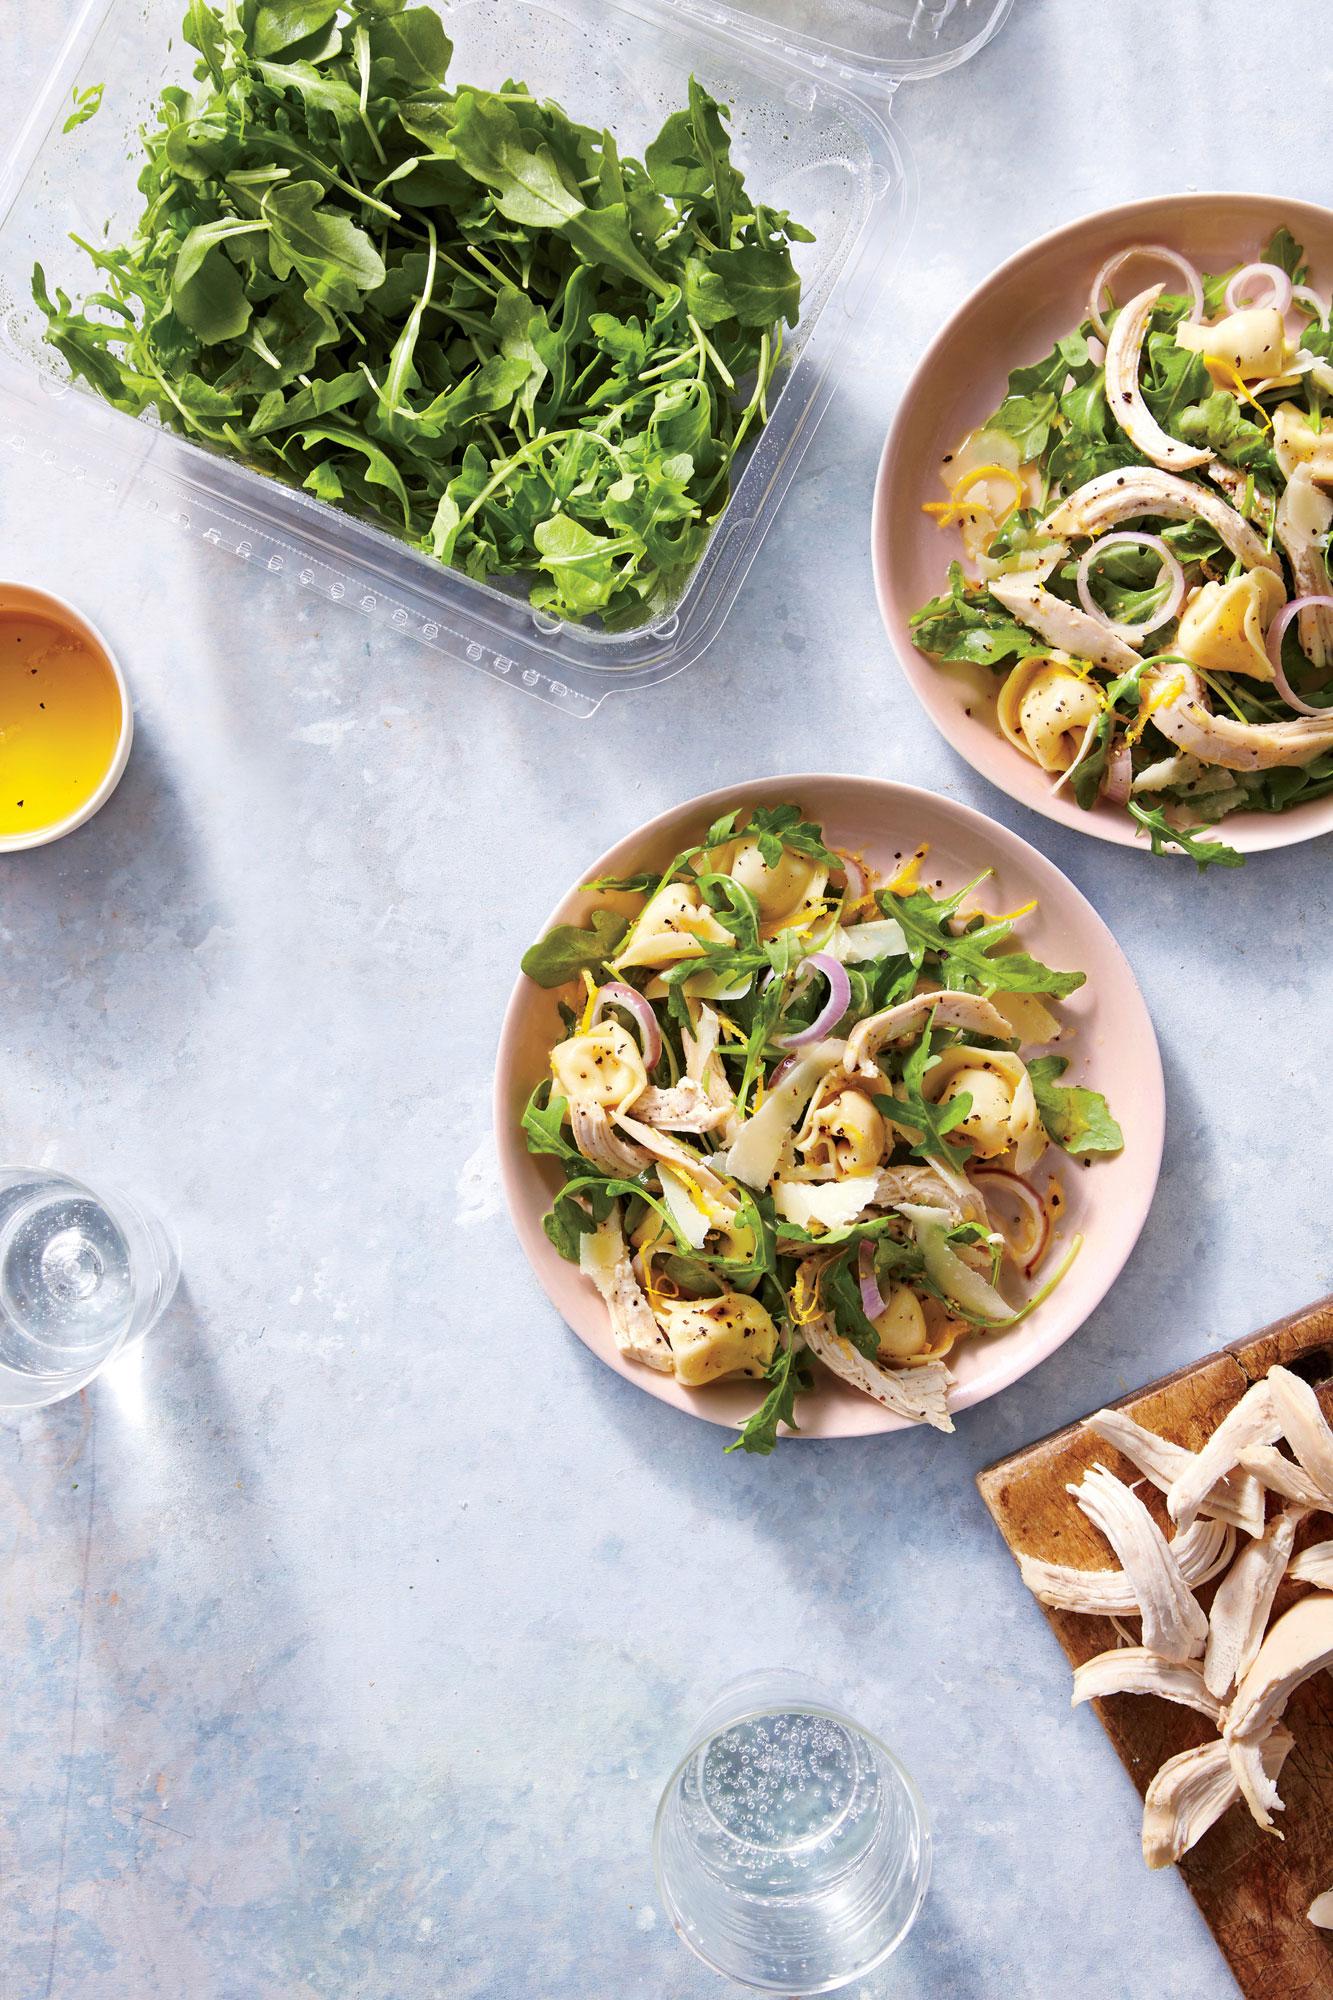 Tortellini, Chicken, and Arugula Salad